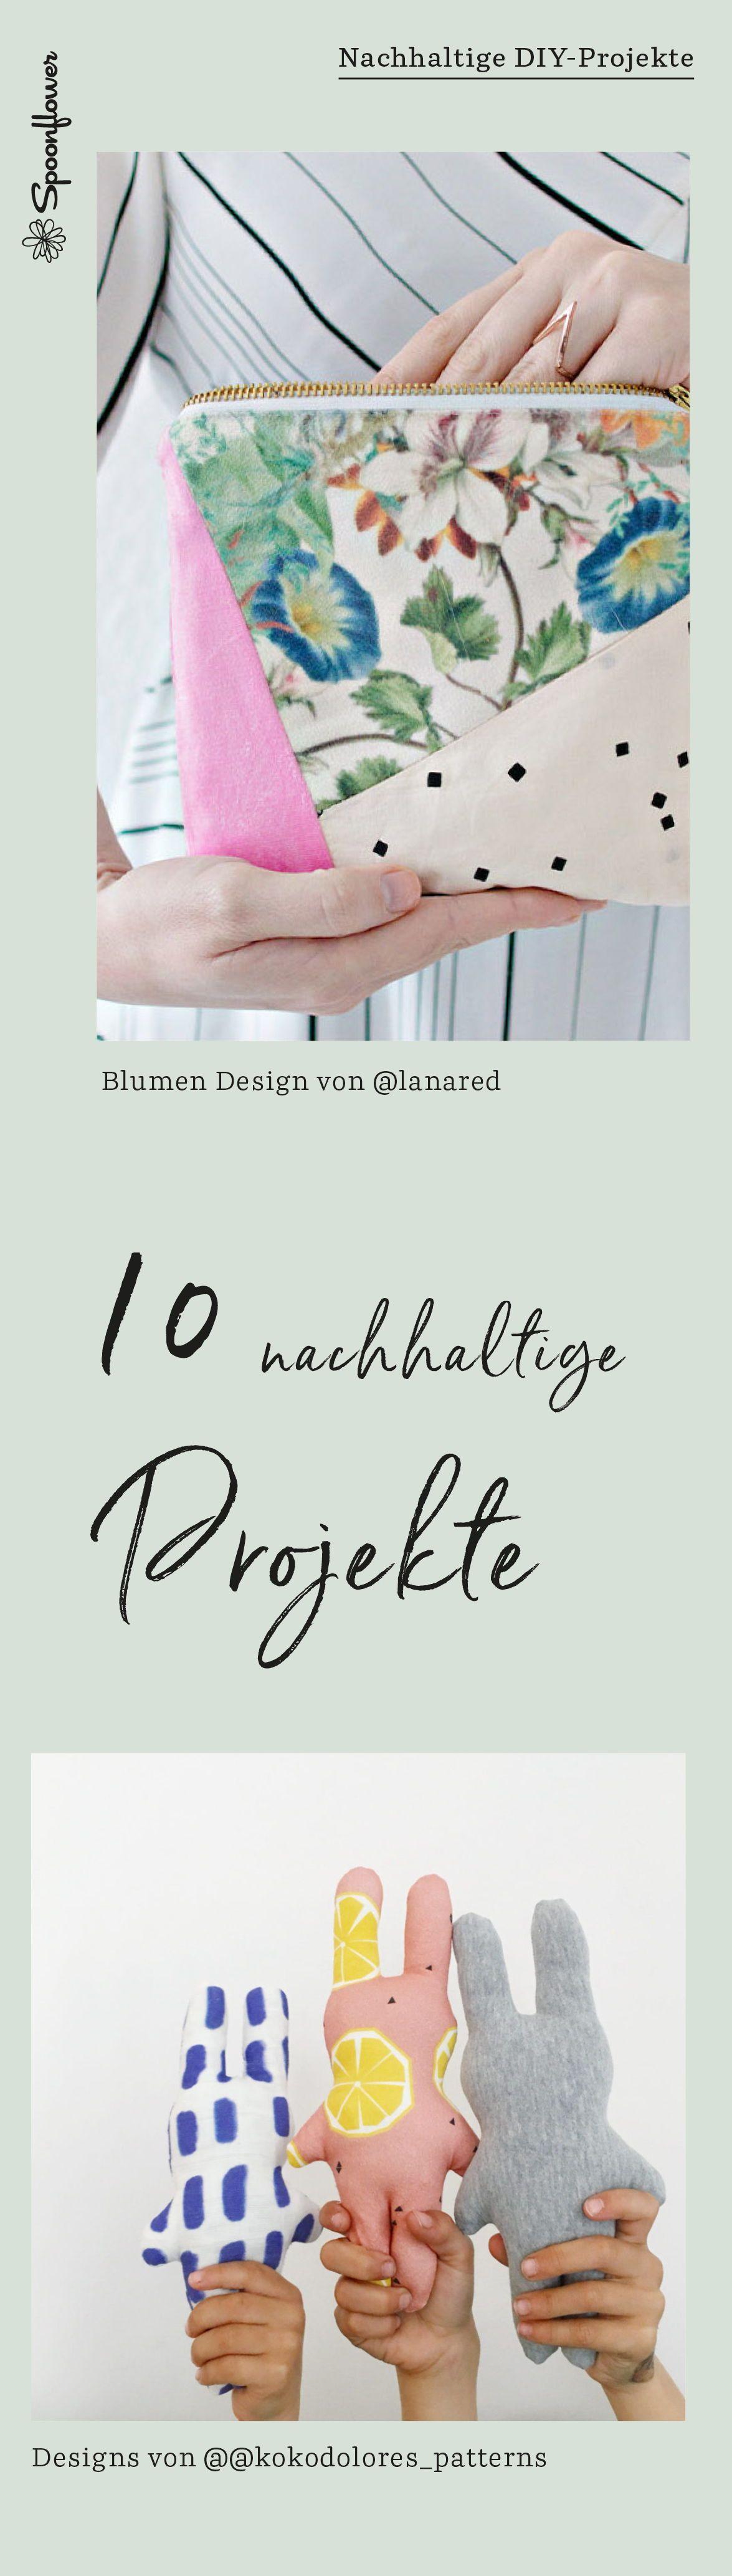 10 nachhaltige DIY-Projekte